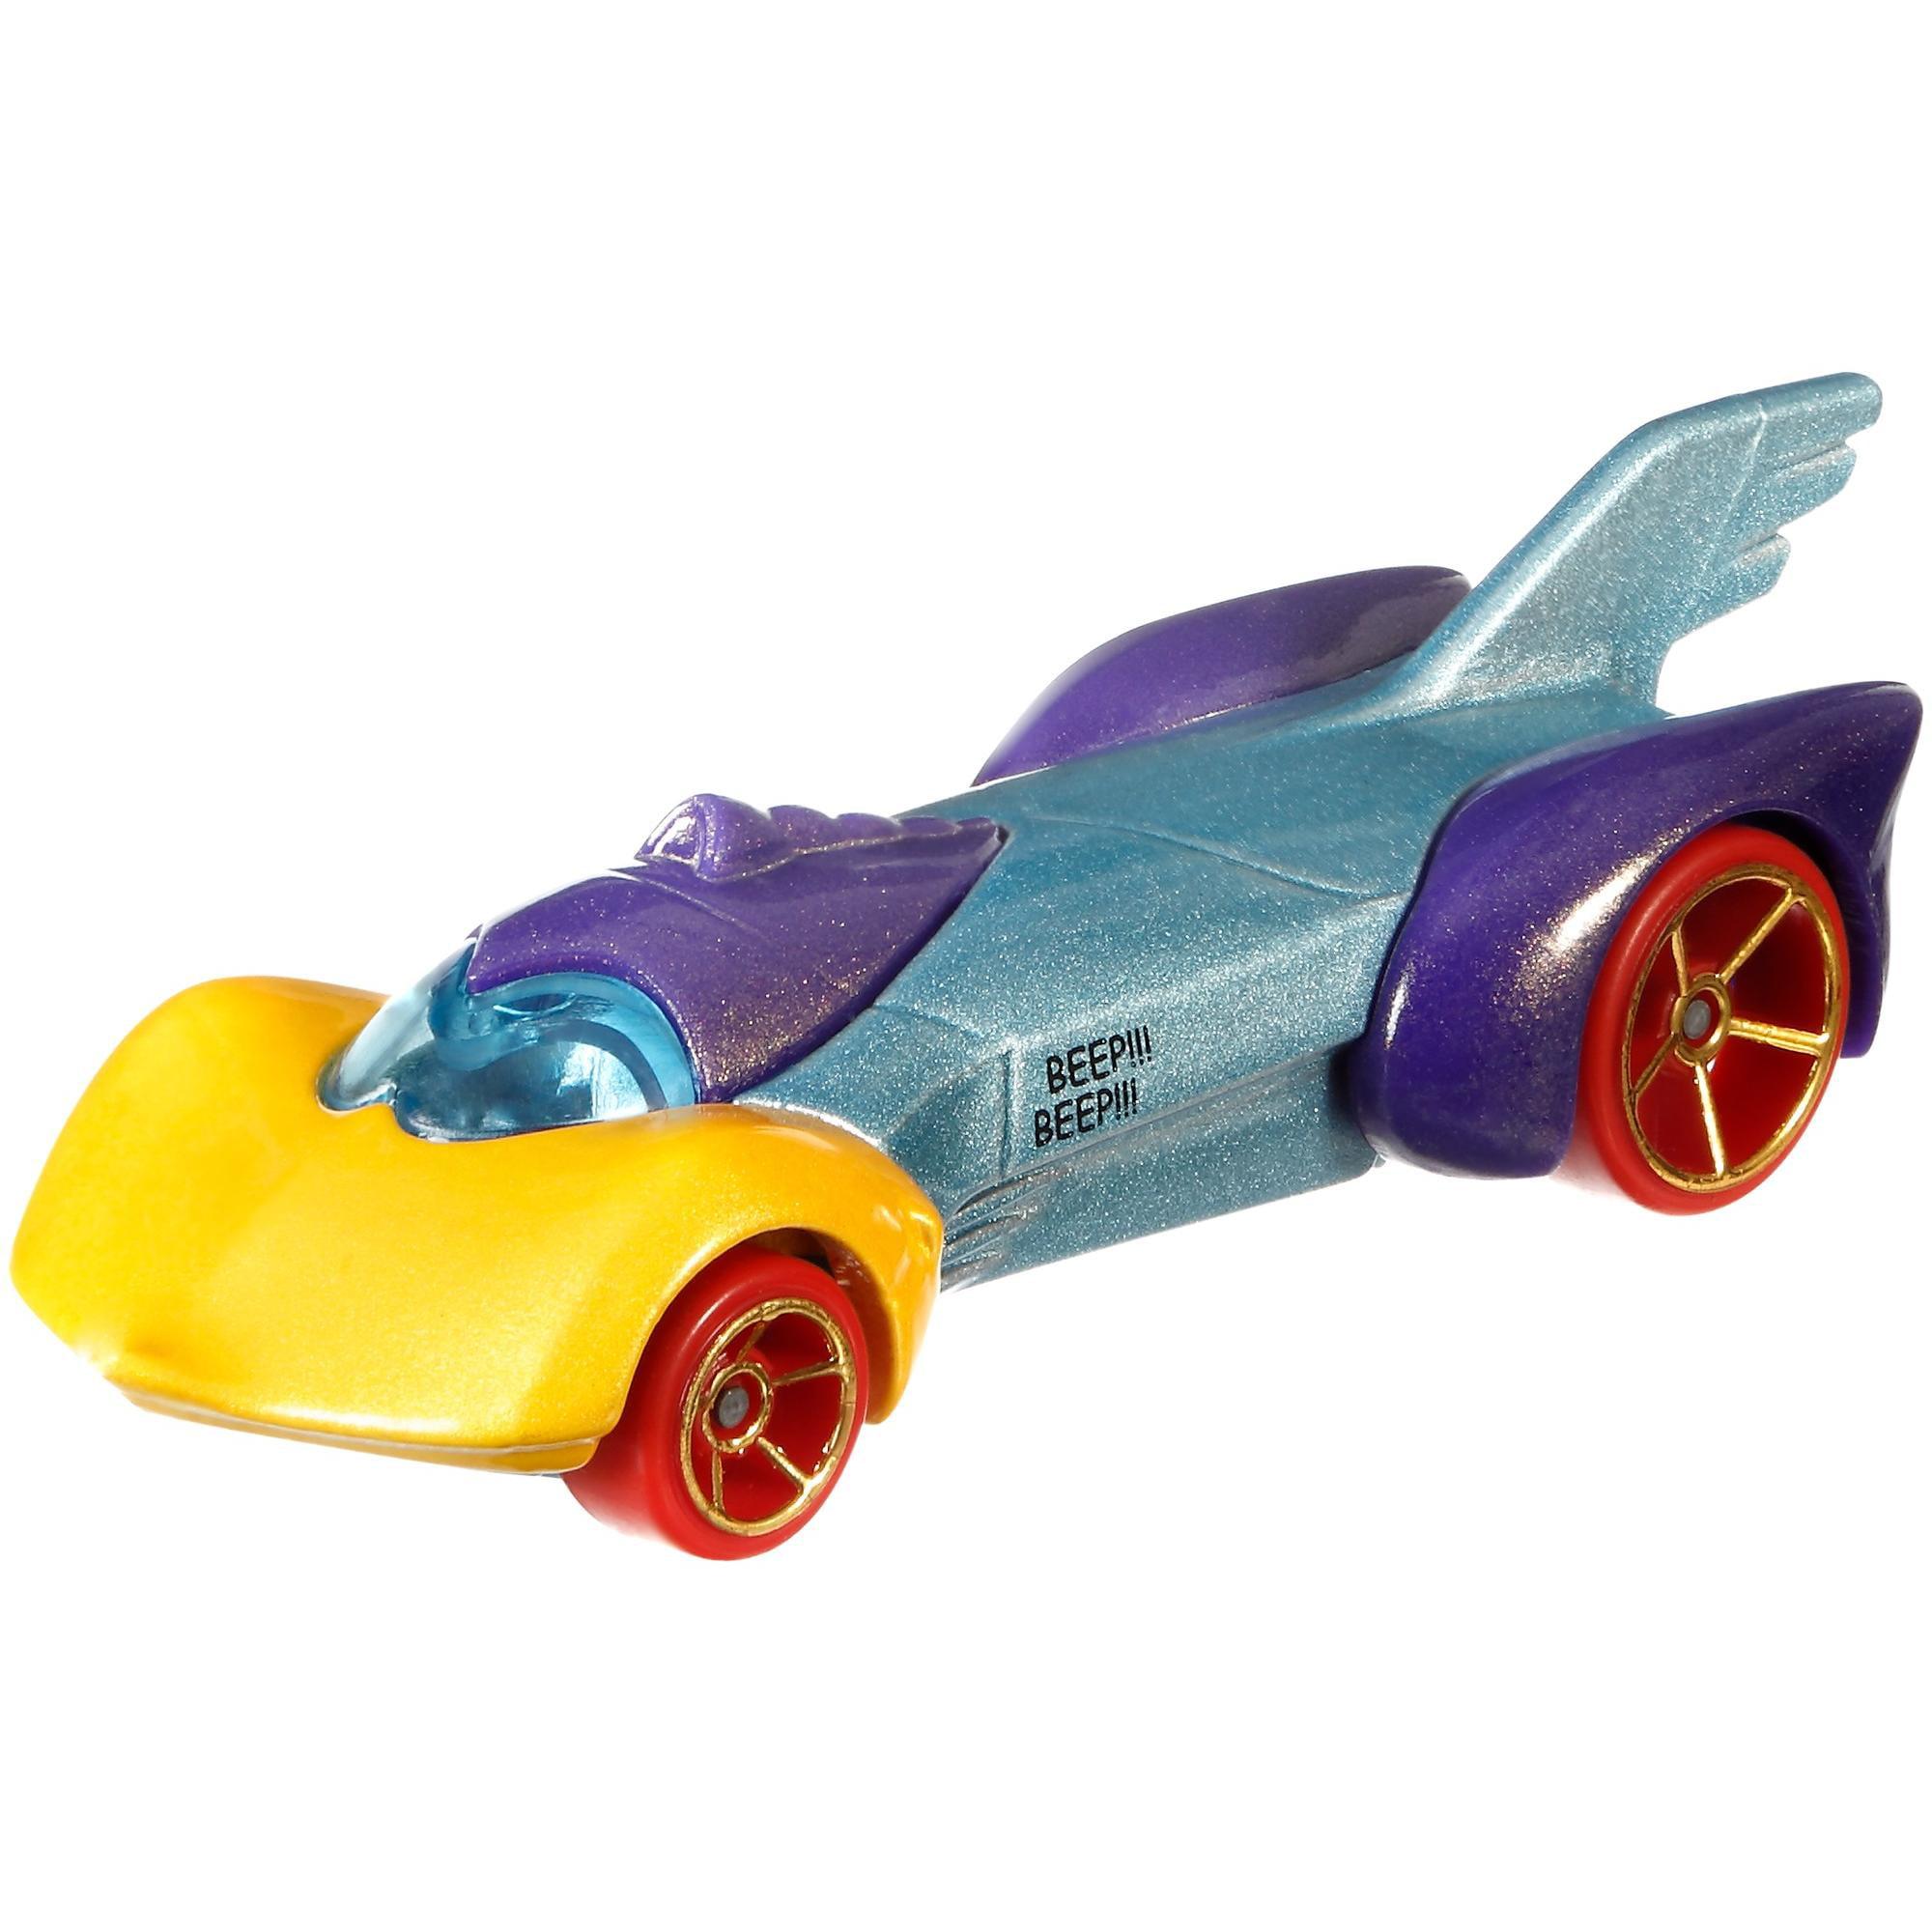 Hot Wheels Roadrunner Character Car